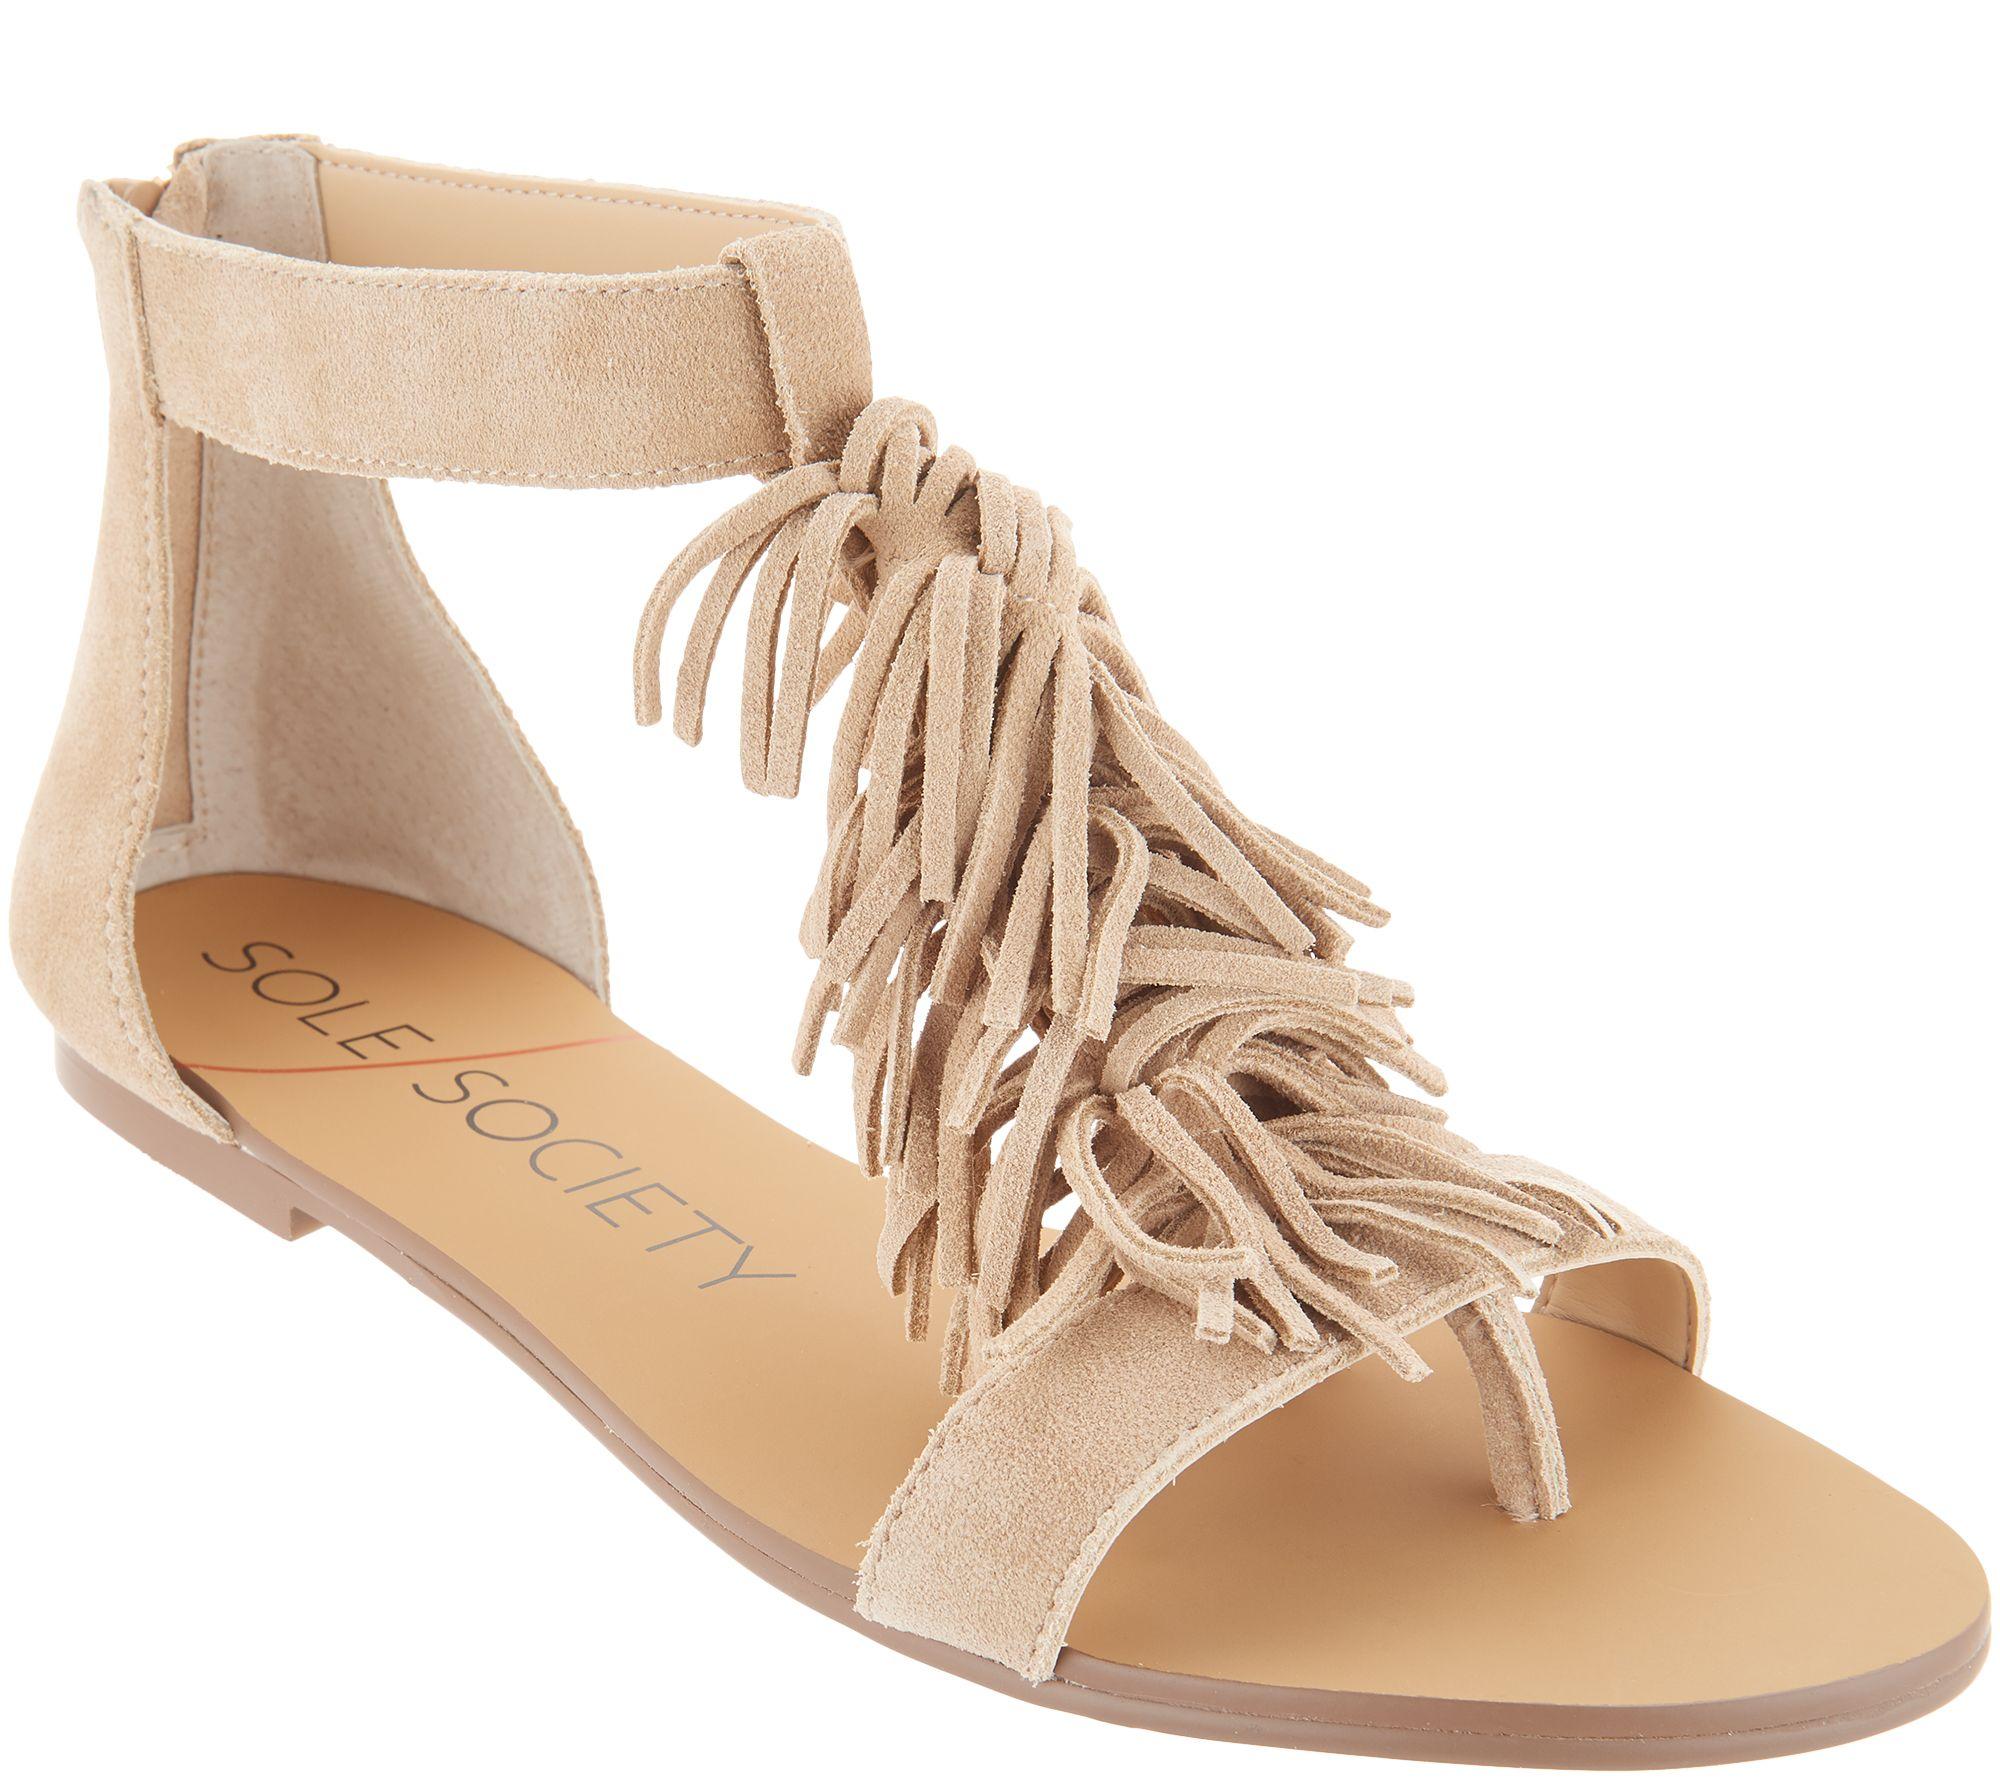 e9ccb9548e218 Sole Society Suede Fringe Flat Sandals - Koa - Page 1 — QVC.com